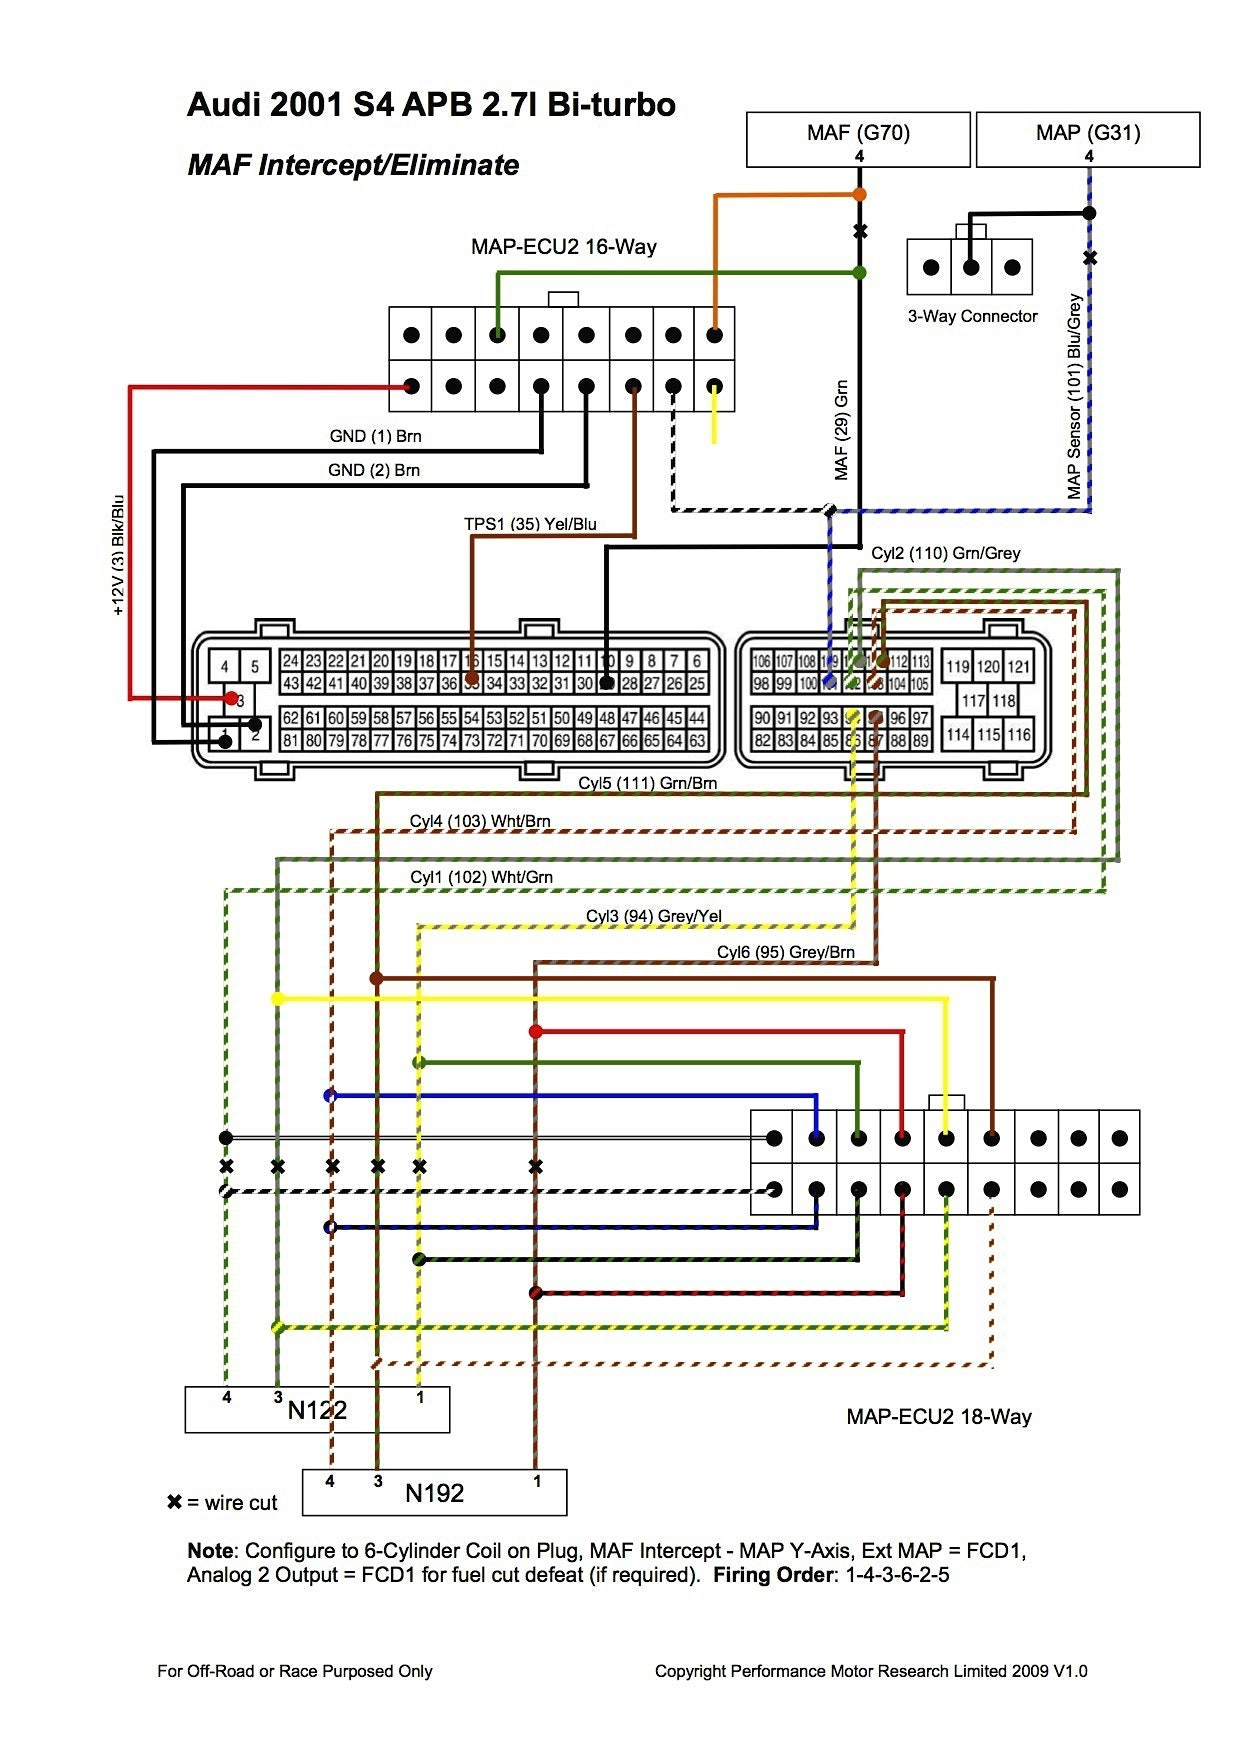 Vw Polo Radio Wiring Diagram Radio Wire Diagram 97 Vw Wiring Diagram